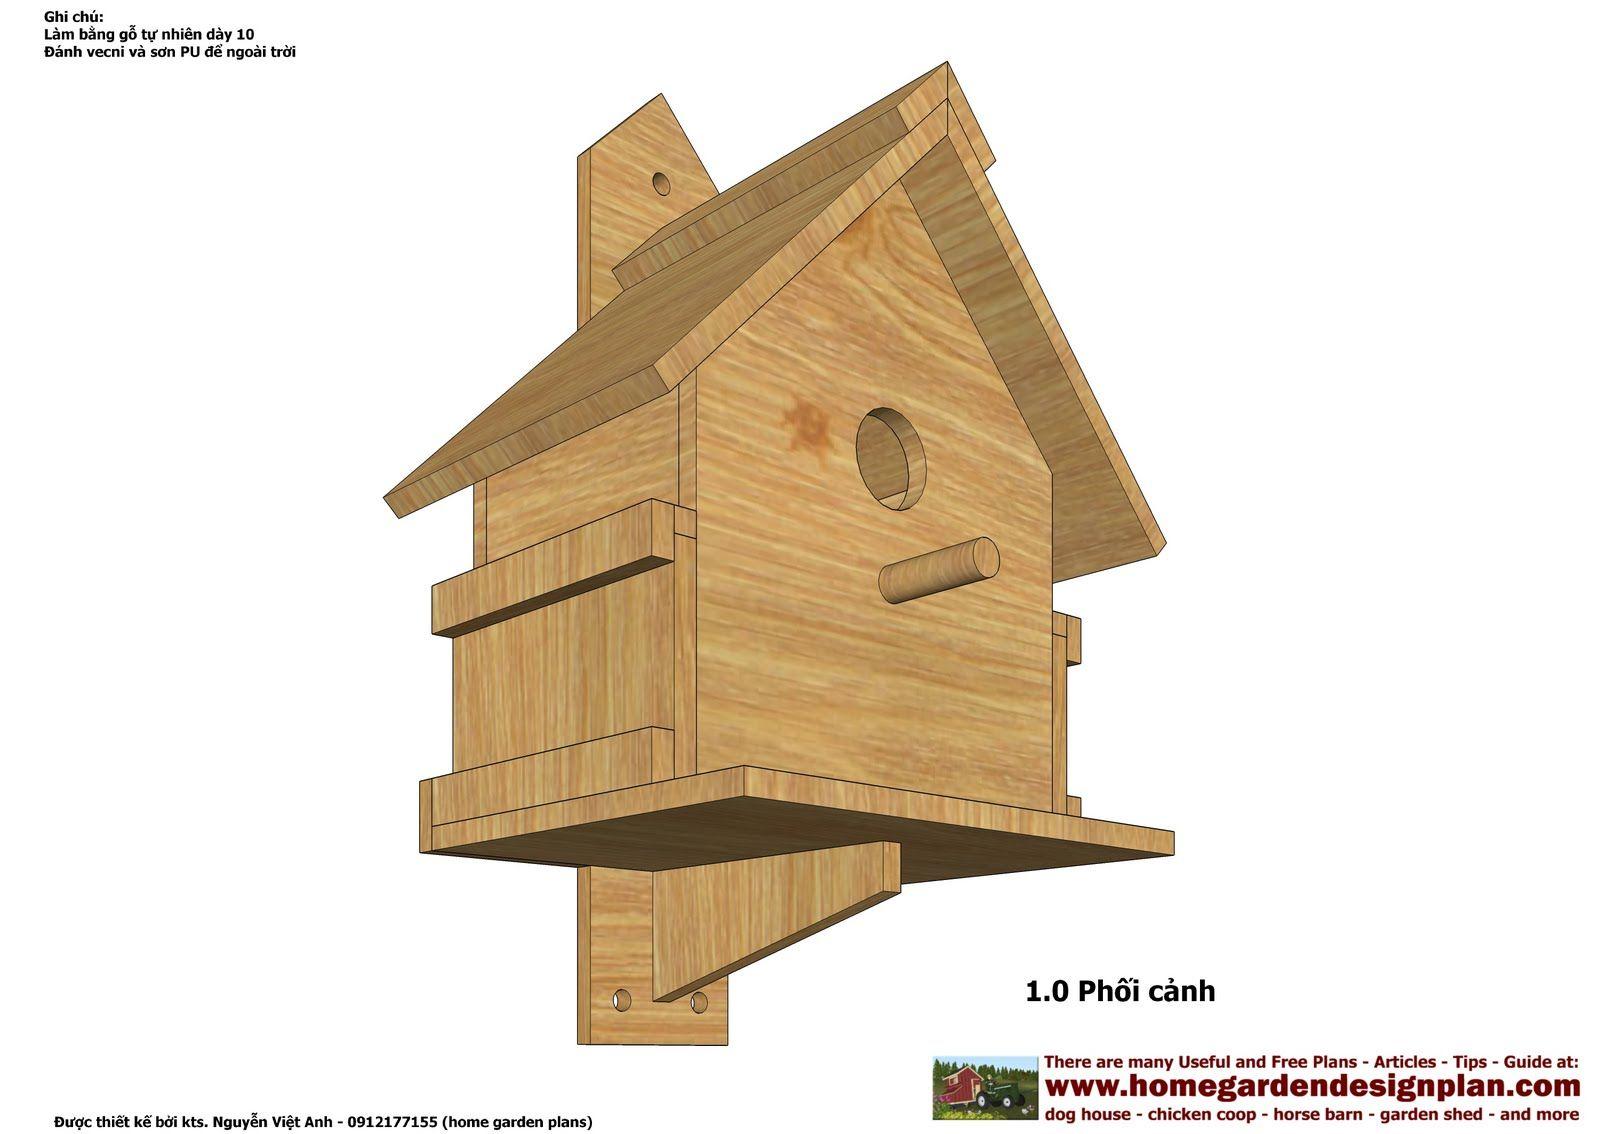 Bat house plans woodwork city free woodworking plans - Bird House Plans Bh100 Bird House Plans Construction Bird House Design